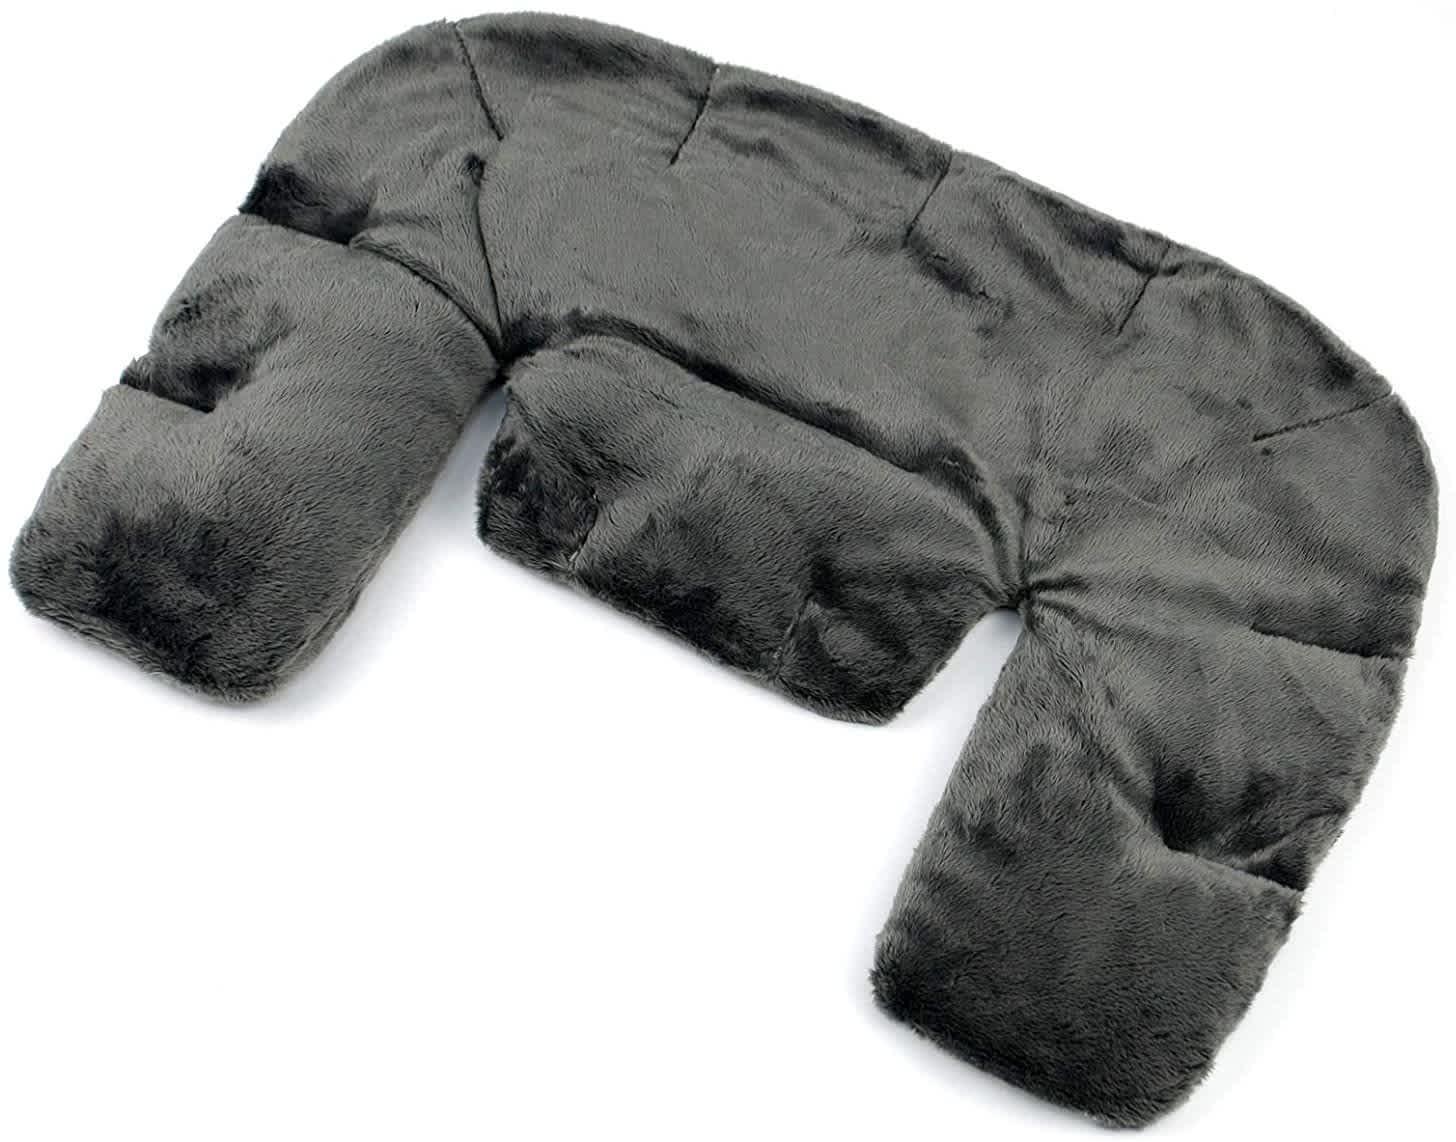 EXF Aromatherapy Neck & Shoulder Pad Wrap